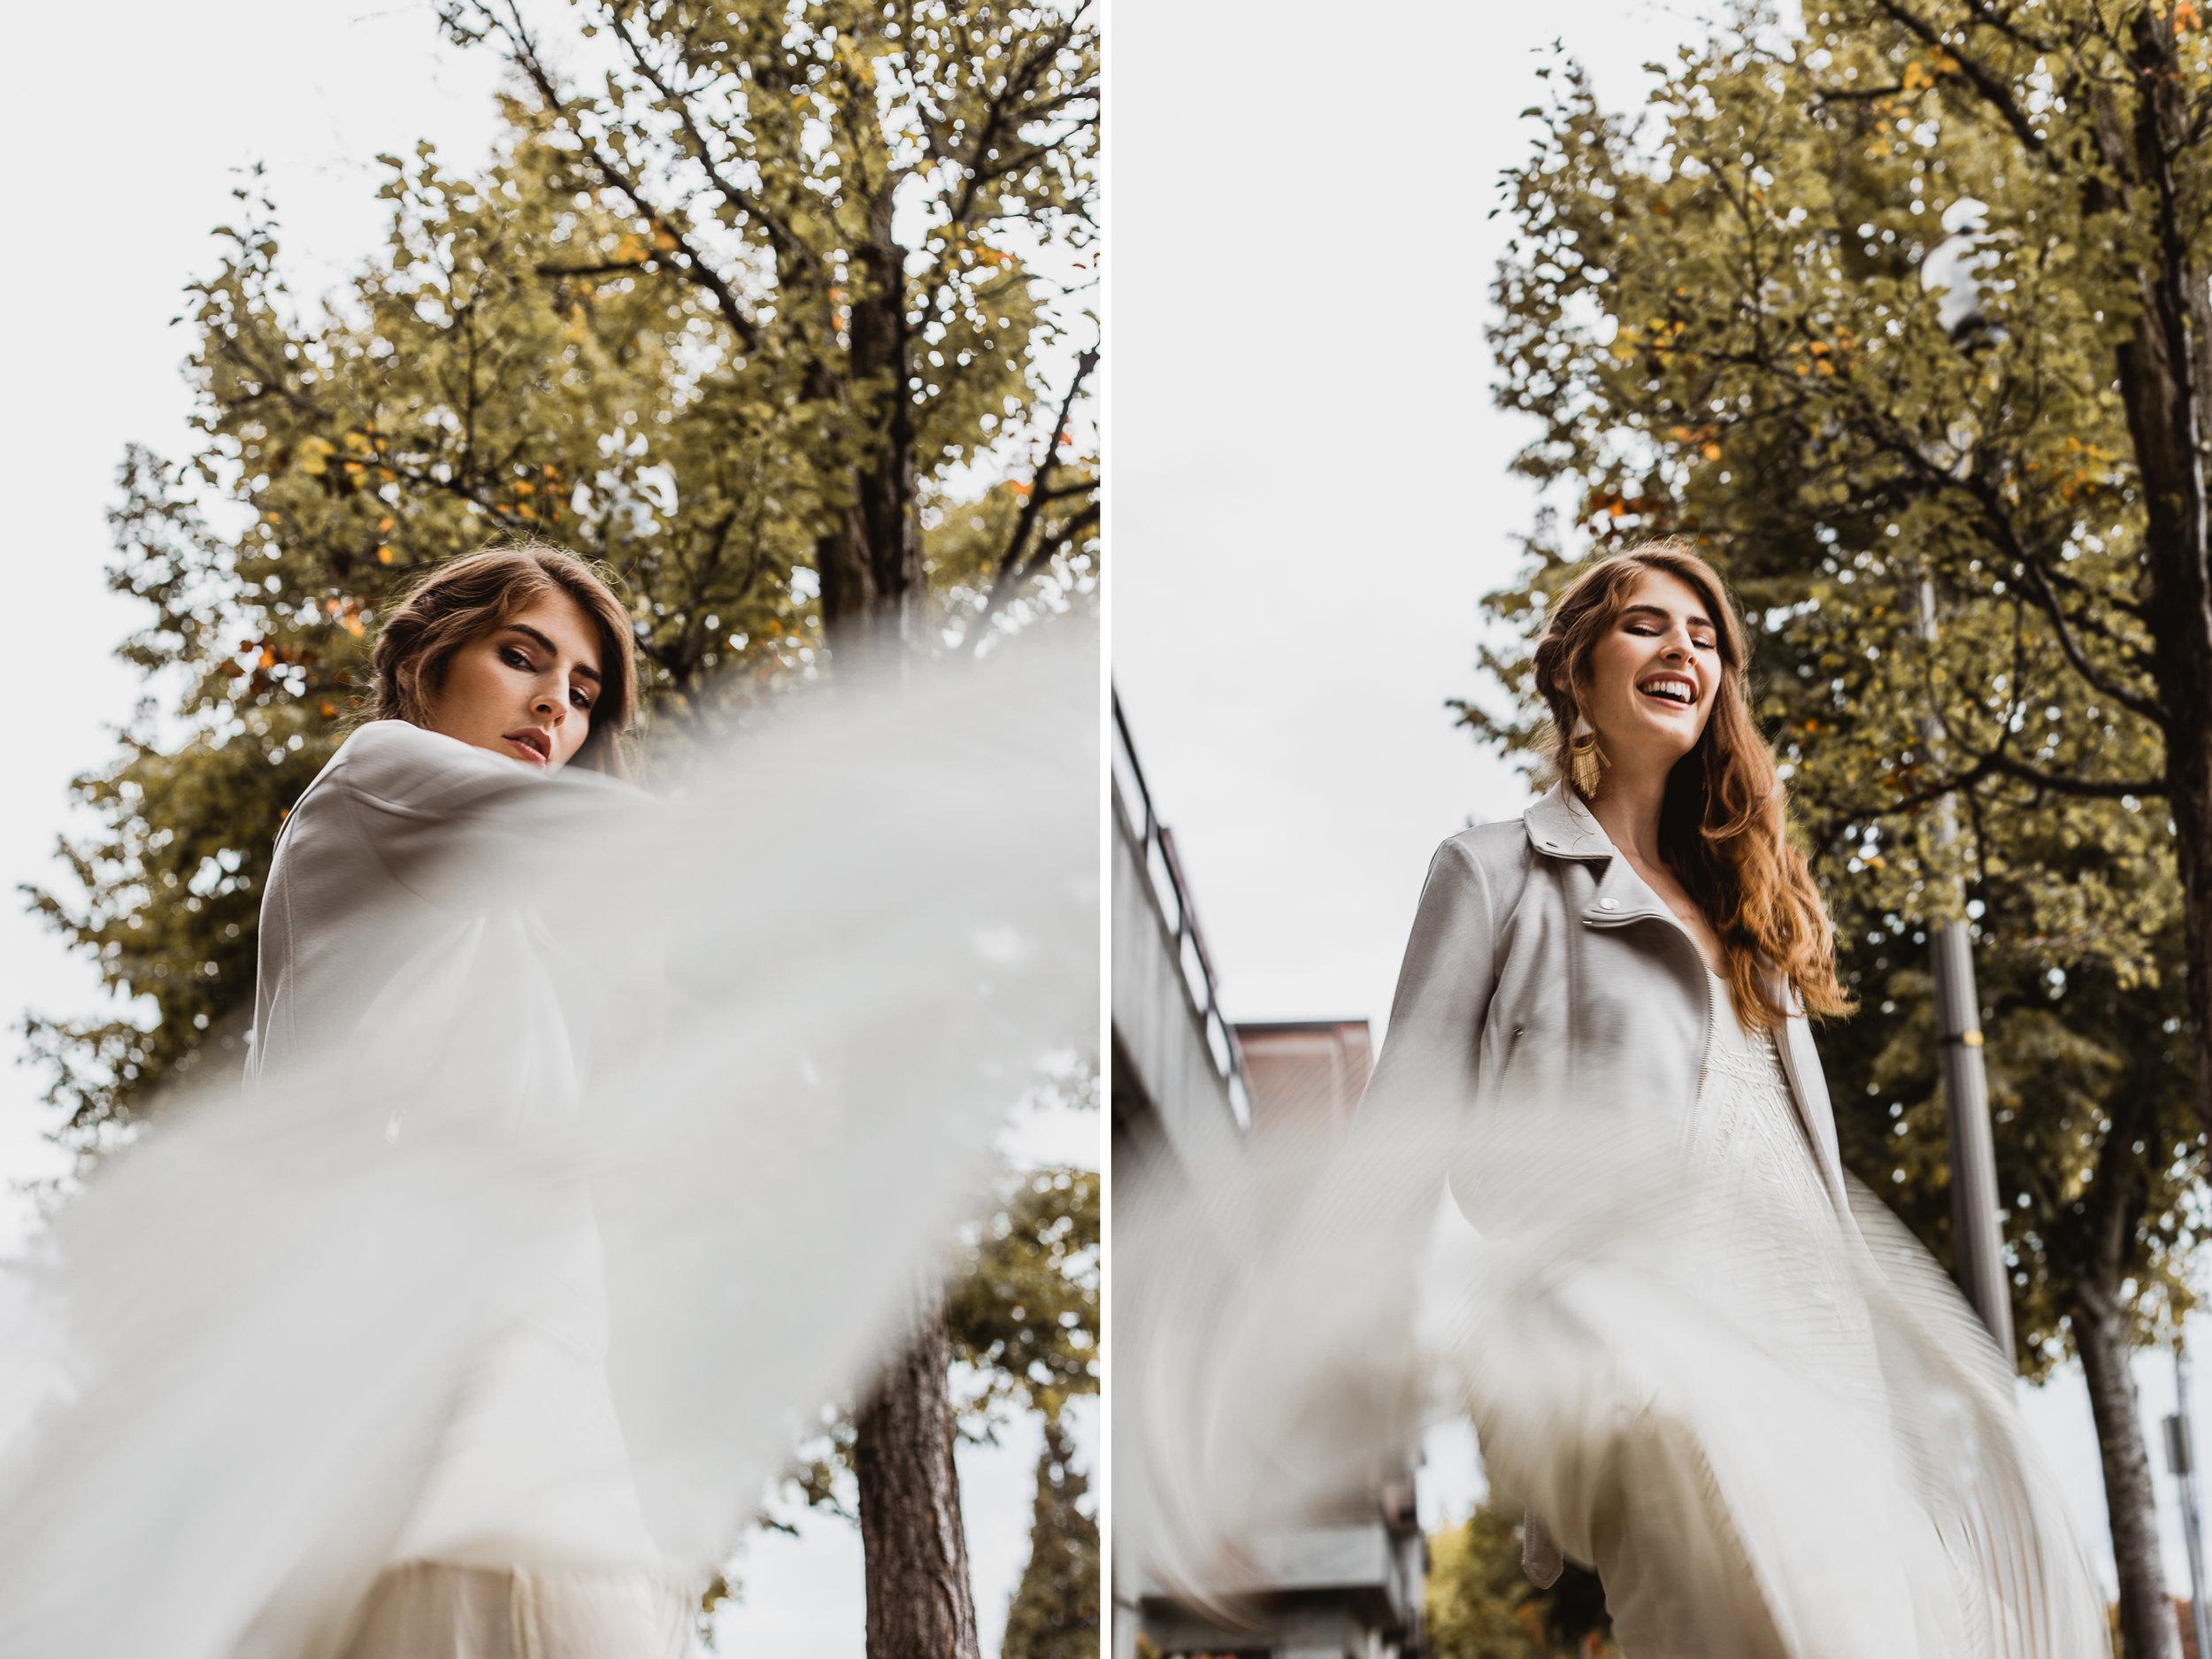 Amy - Bridal Styled Shoot - Vancouver WA - Malina Rose Photography-D9.jpg